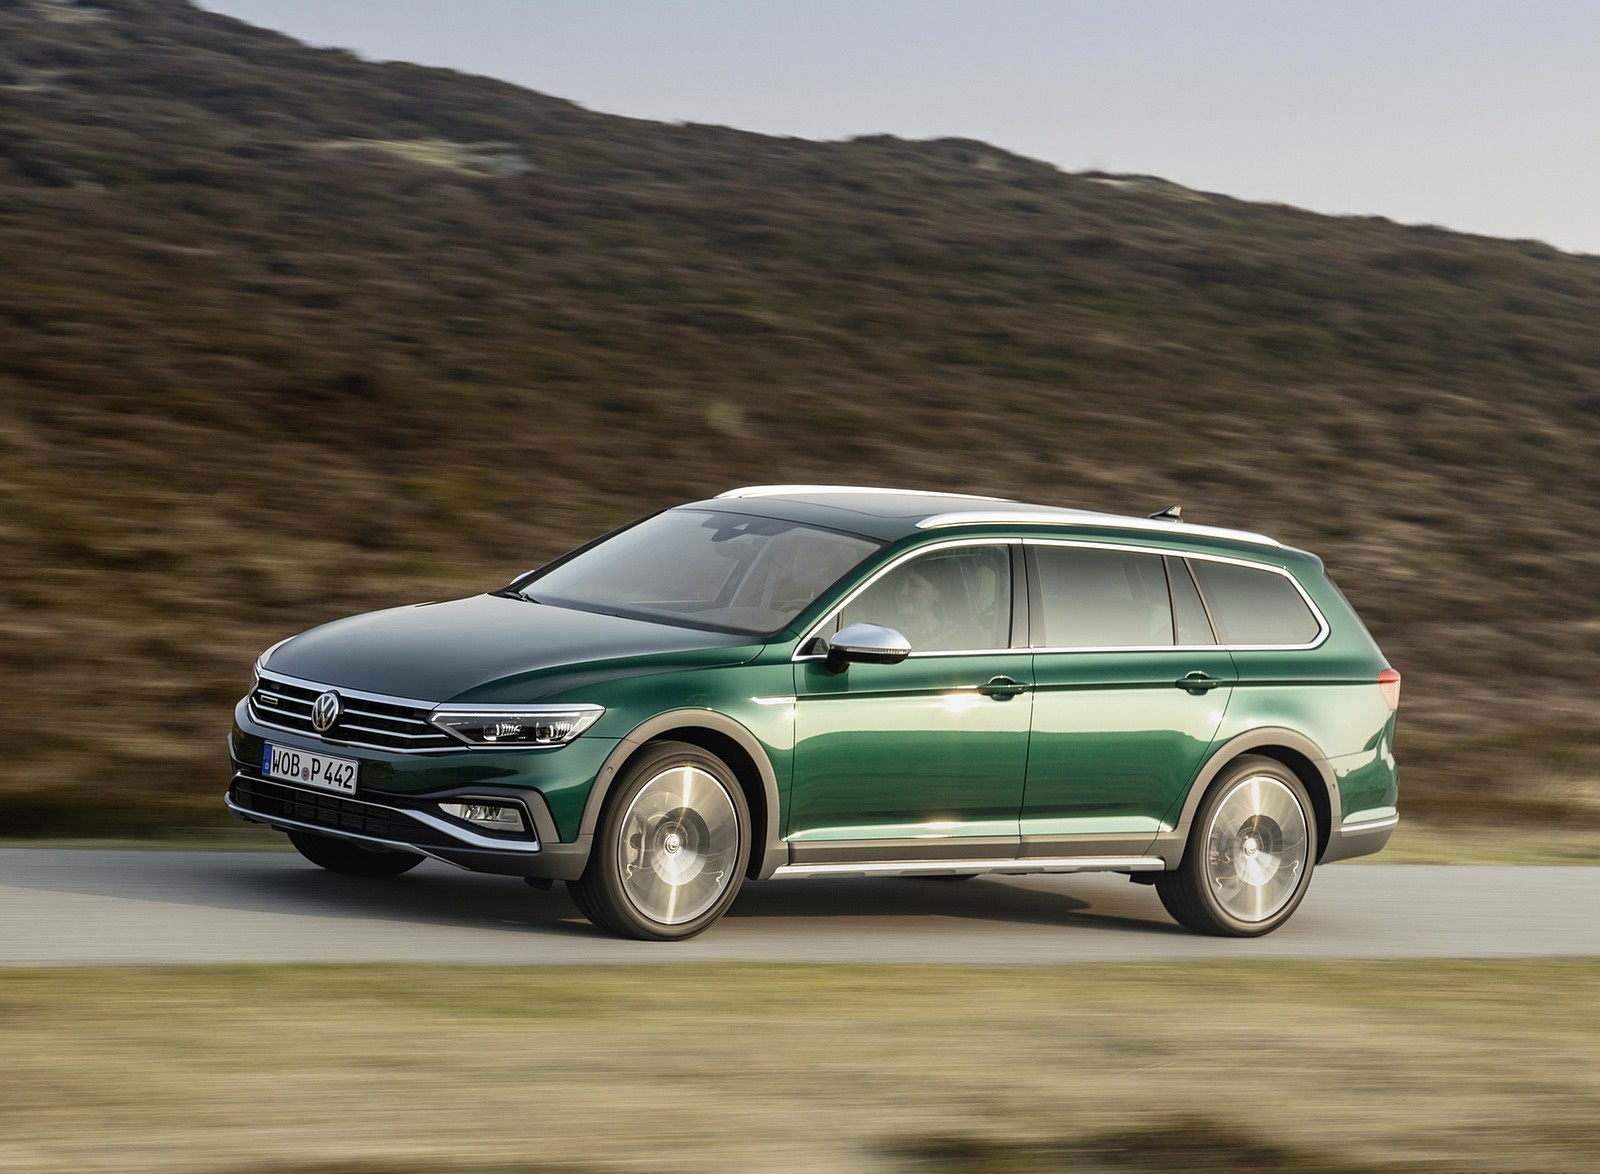 2020 Volkswagen Passat Alltrack (EU-Spec) Front Three-Quarter Wallpapers (4)